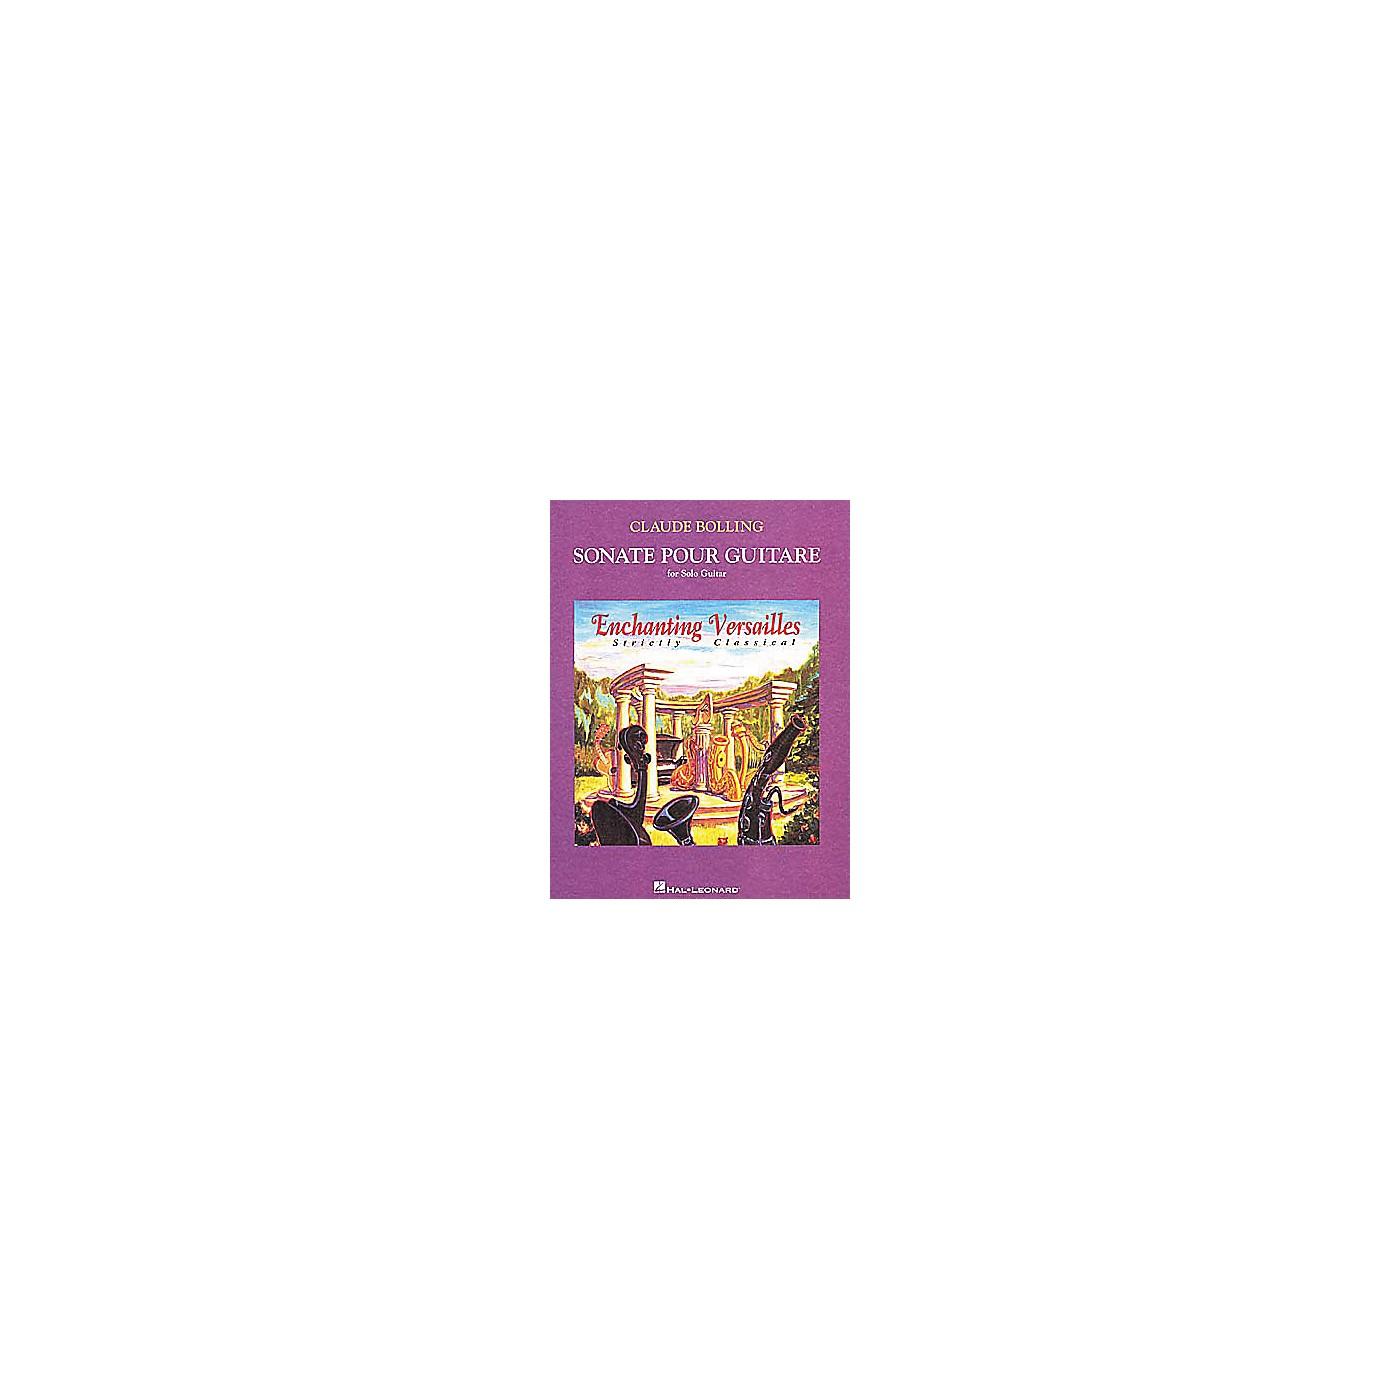 Hal Leonard Claude Bolling - Sonate Pour Guitare(Book) thumbnail